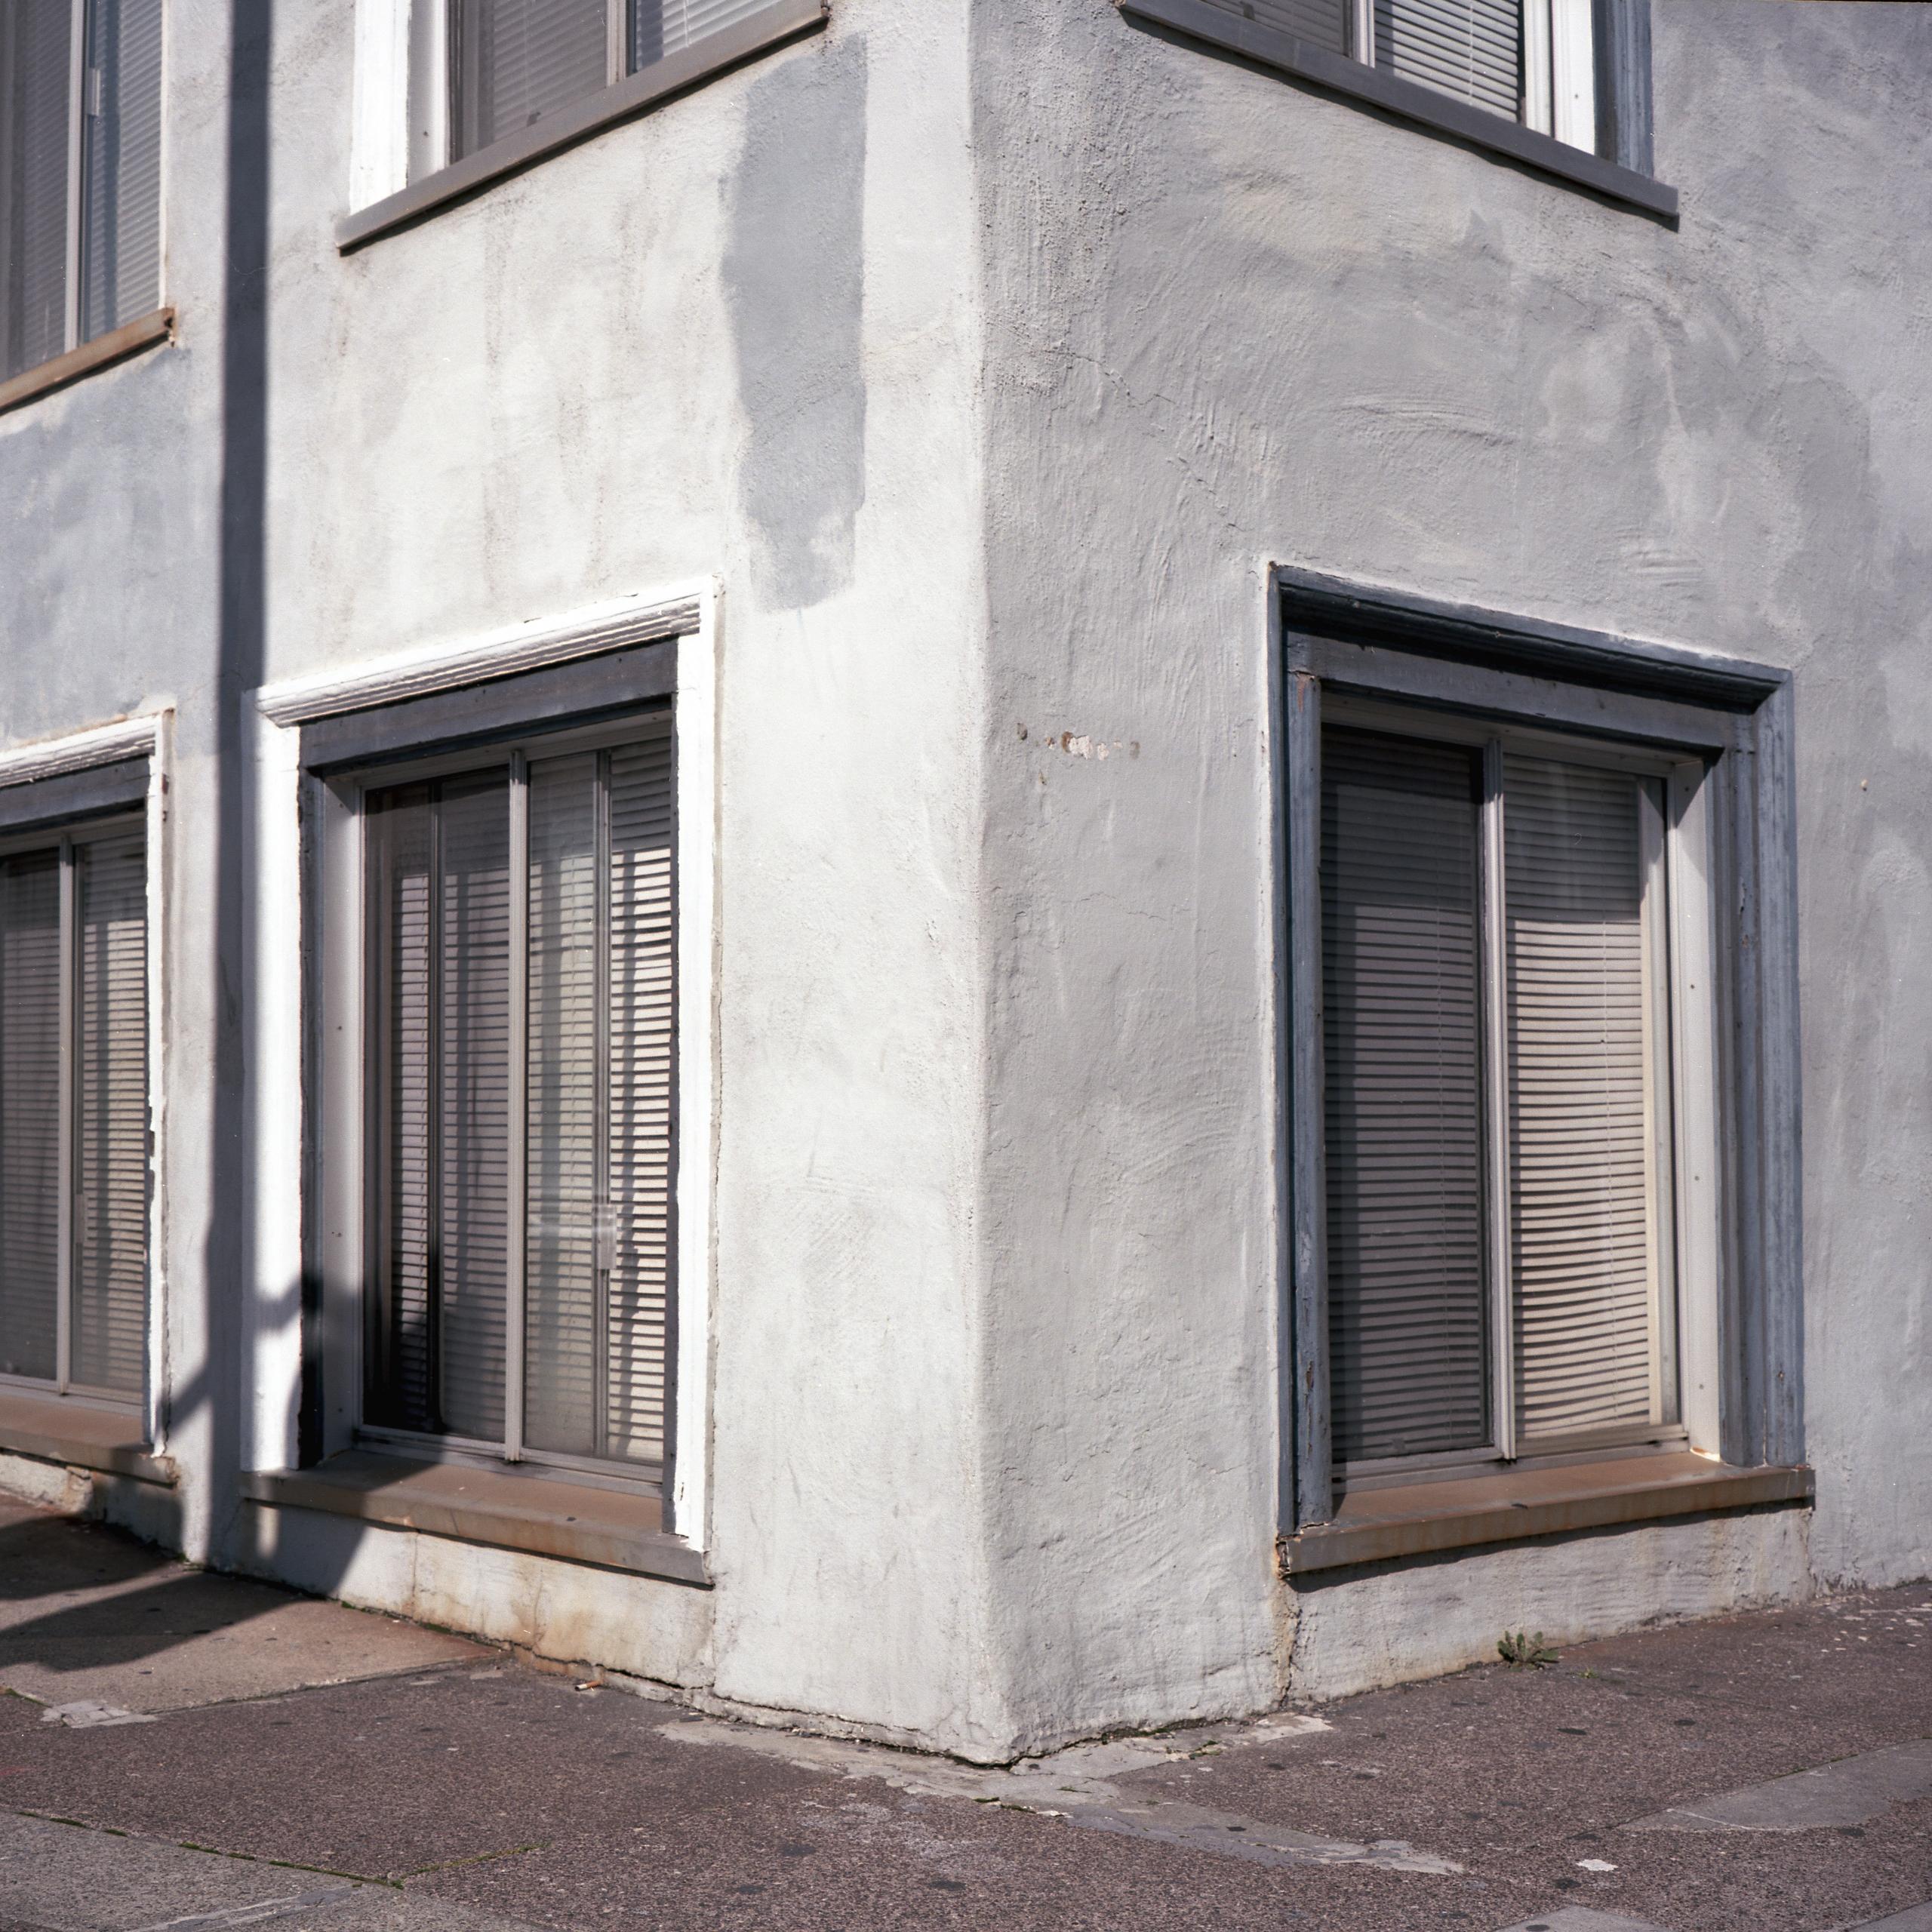 Ground floor Kodak Ektar 100 Ma - biosfear | ello